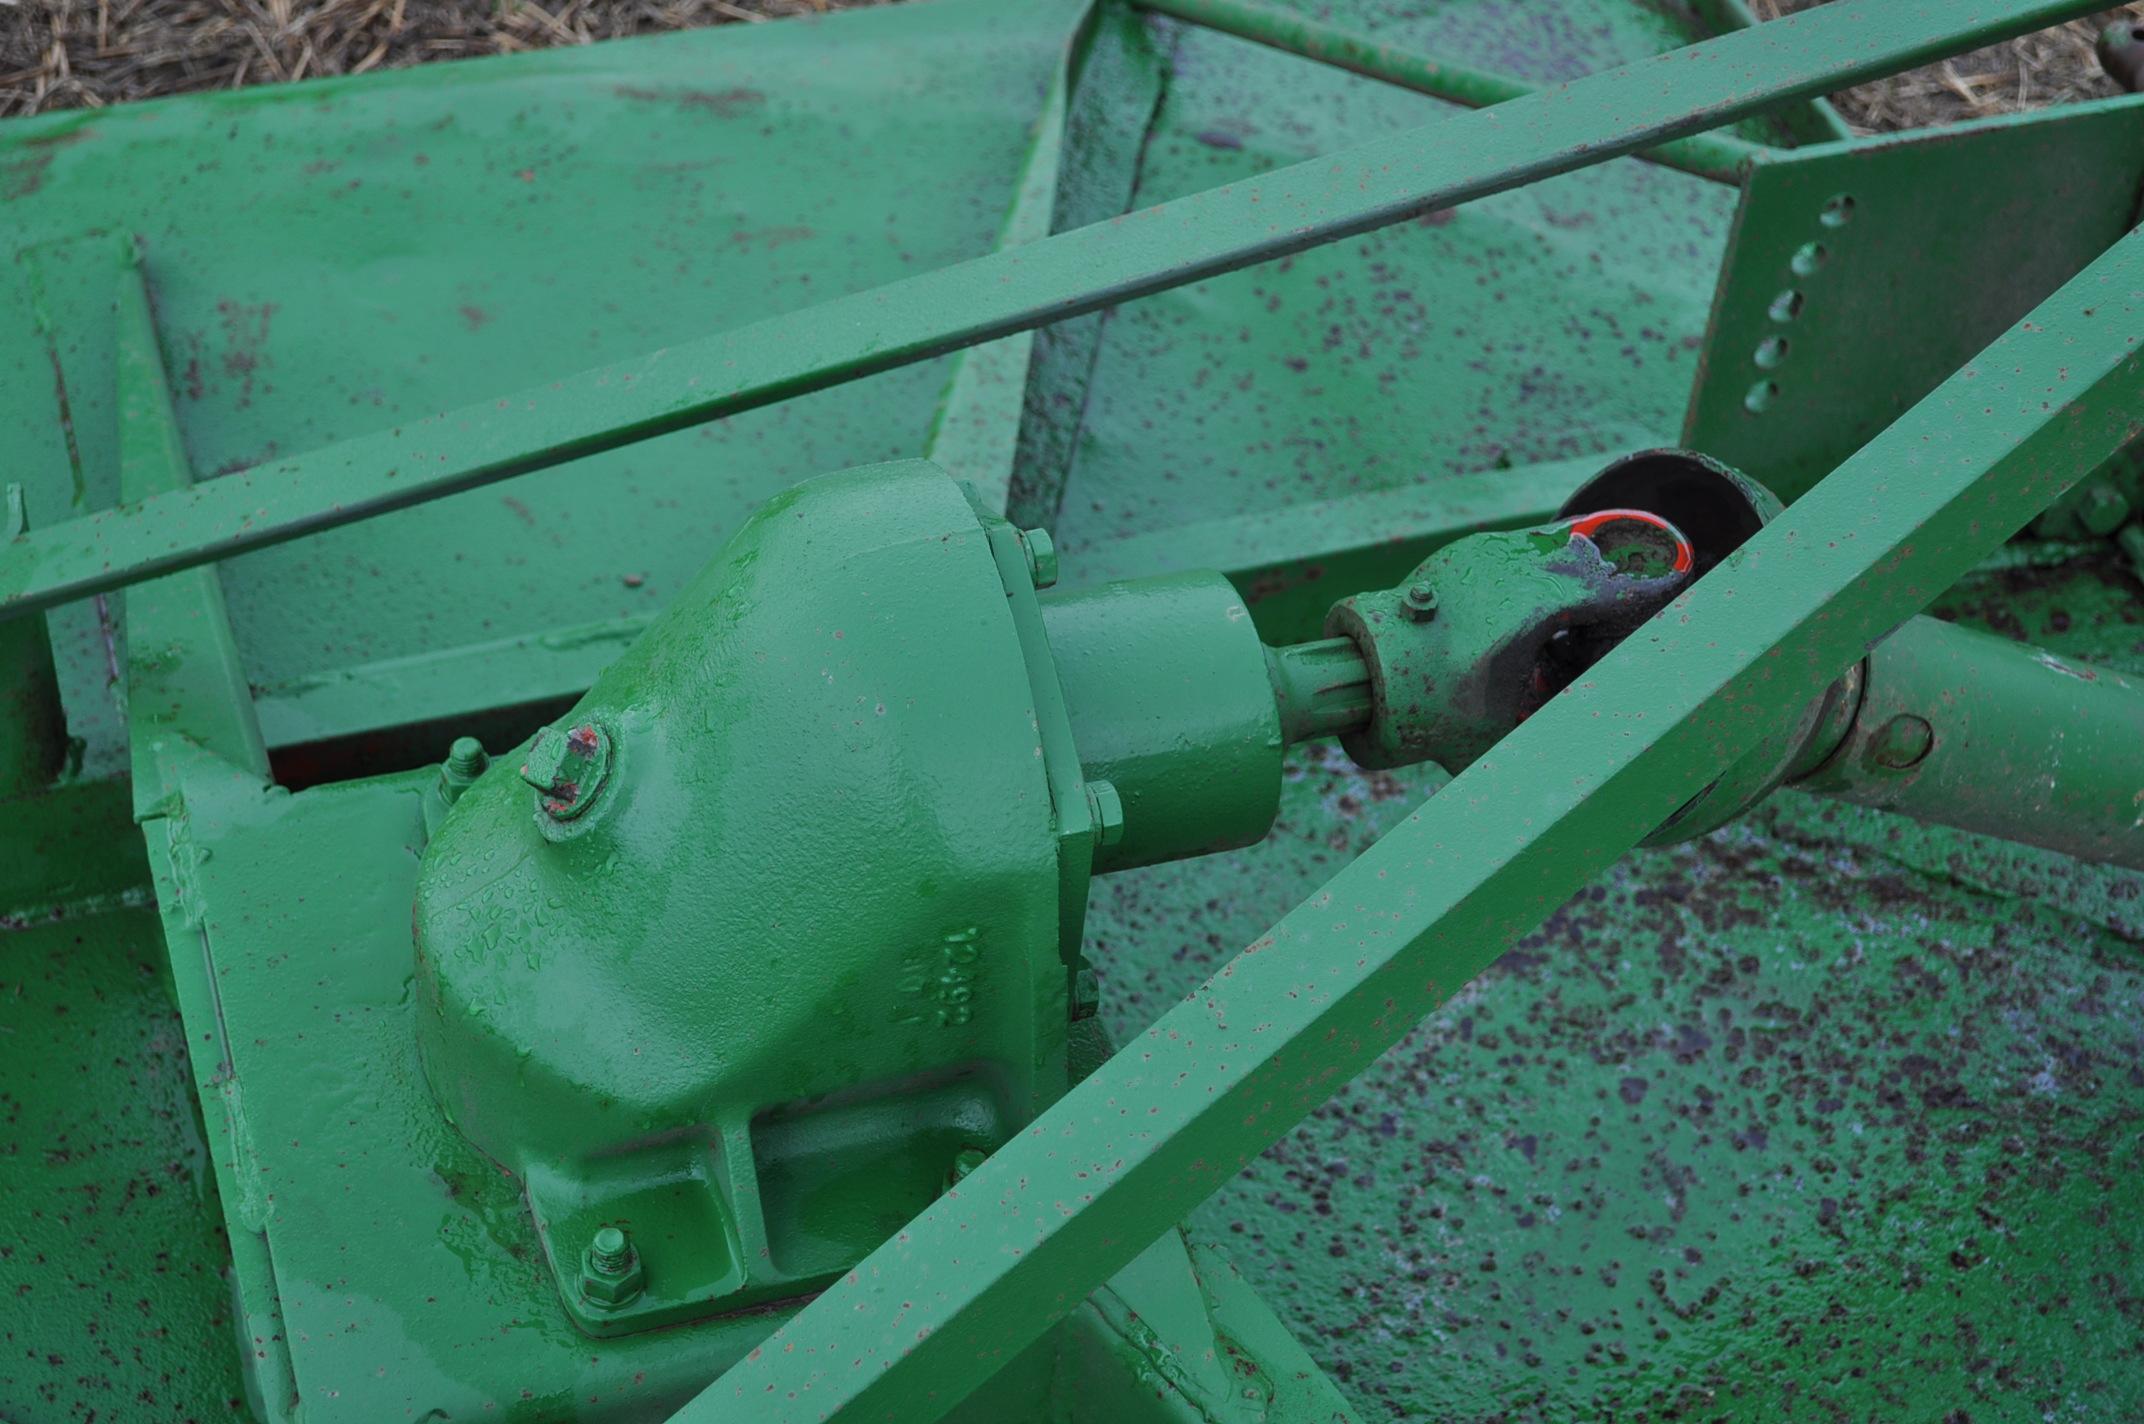 6' John Deere 3pt. rotary mower - Image 5 of 7